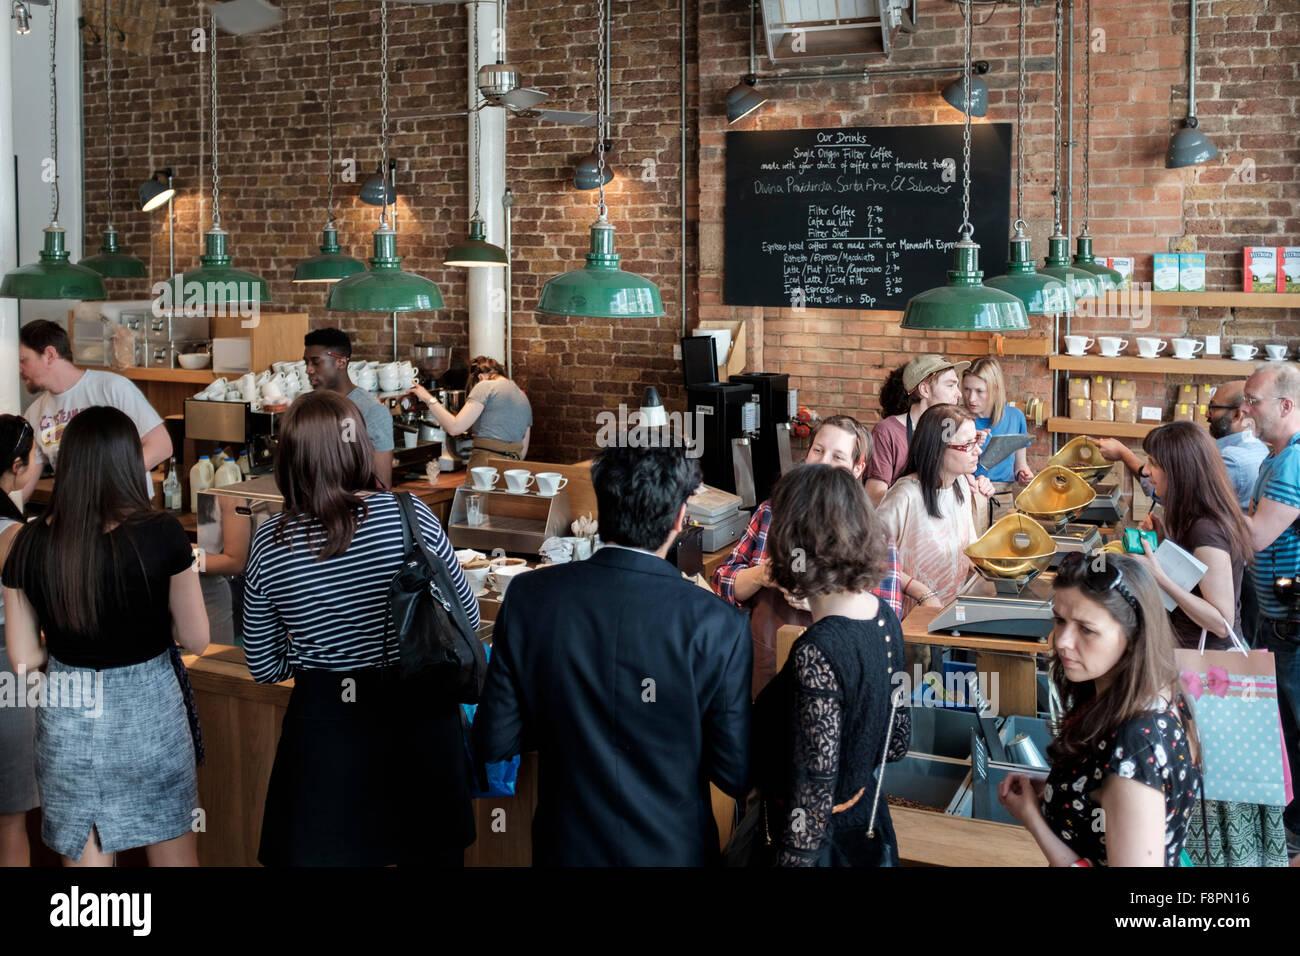 Busy artisan coffee shop,London,England - Stock Image